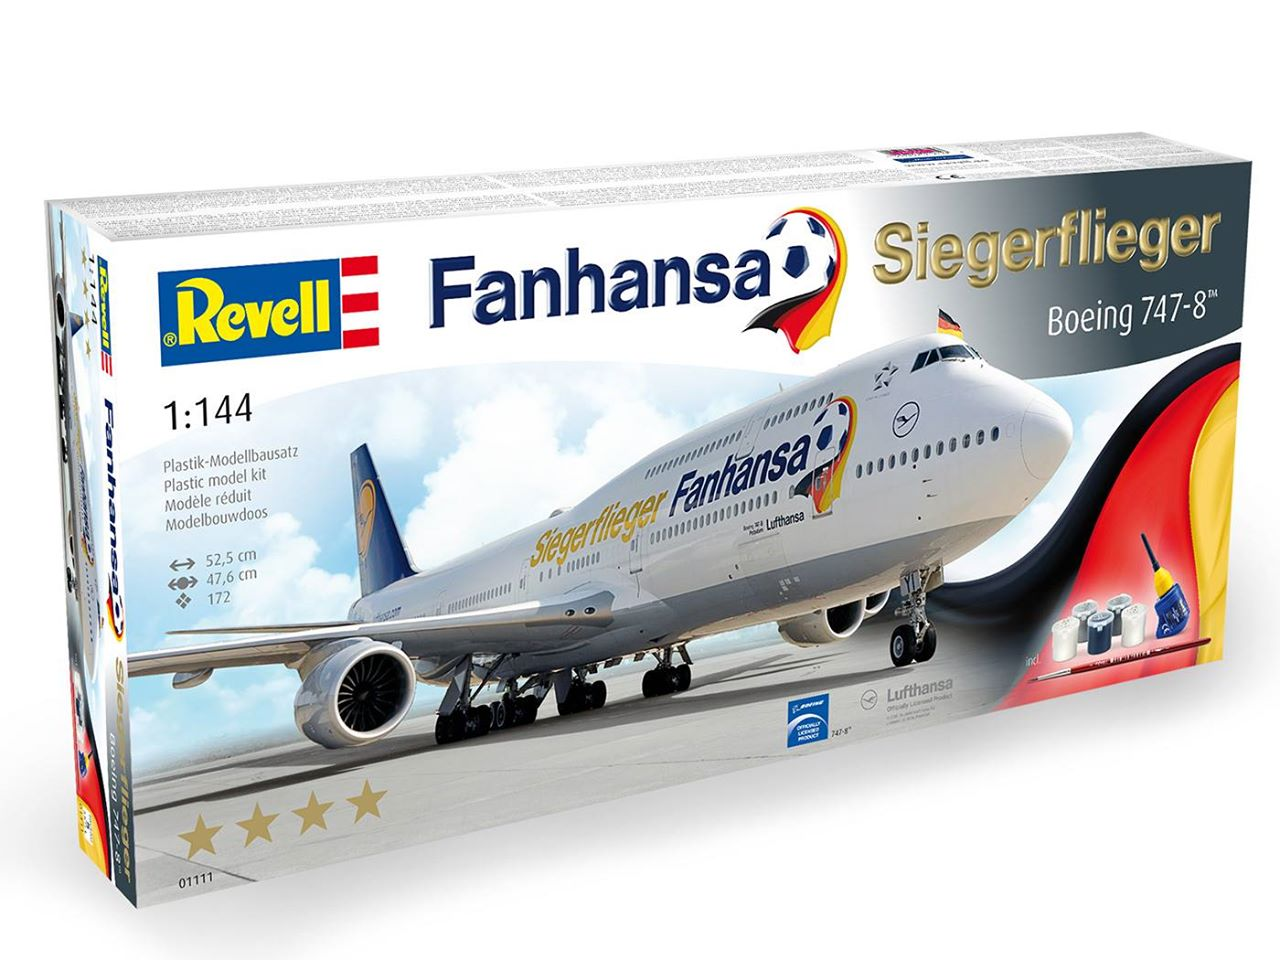 Fanhansa-Siegerflieger-Verpackung